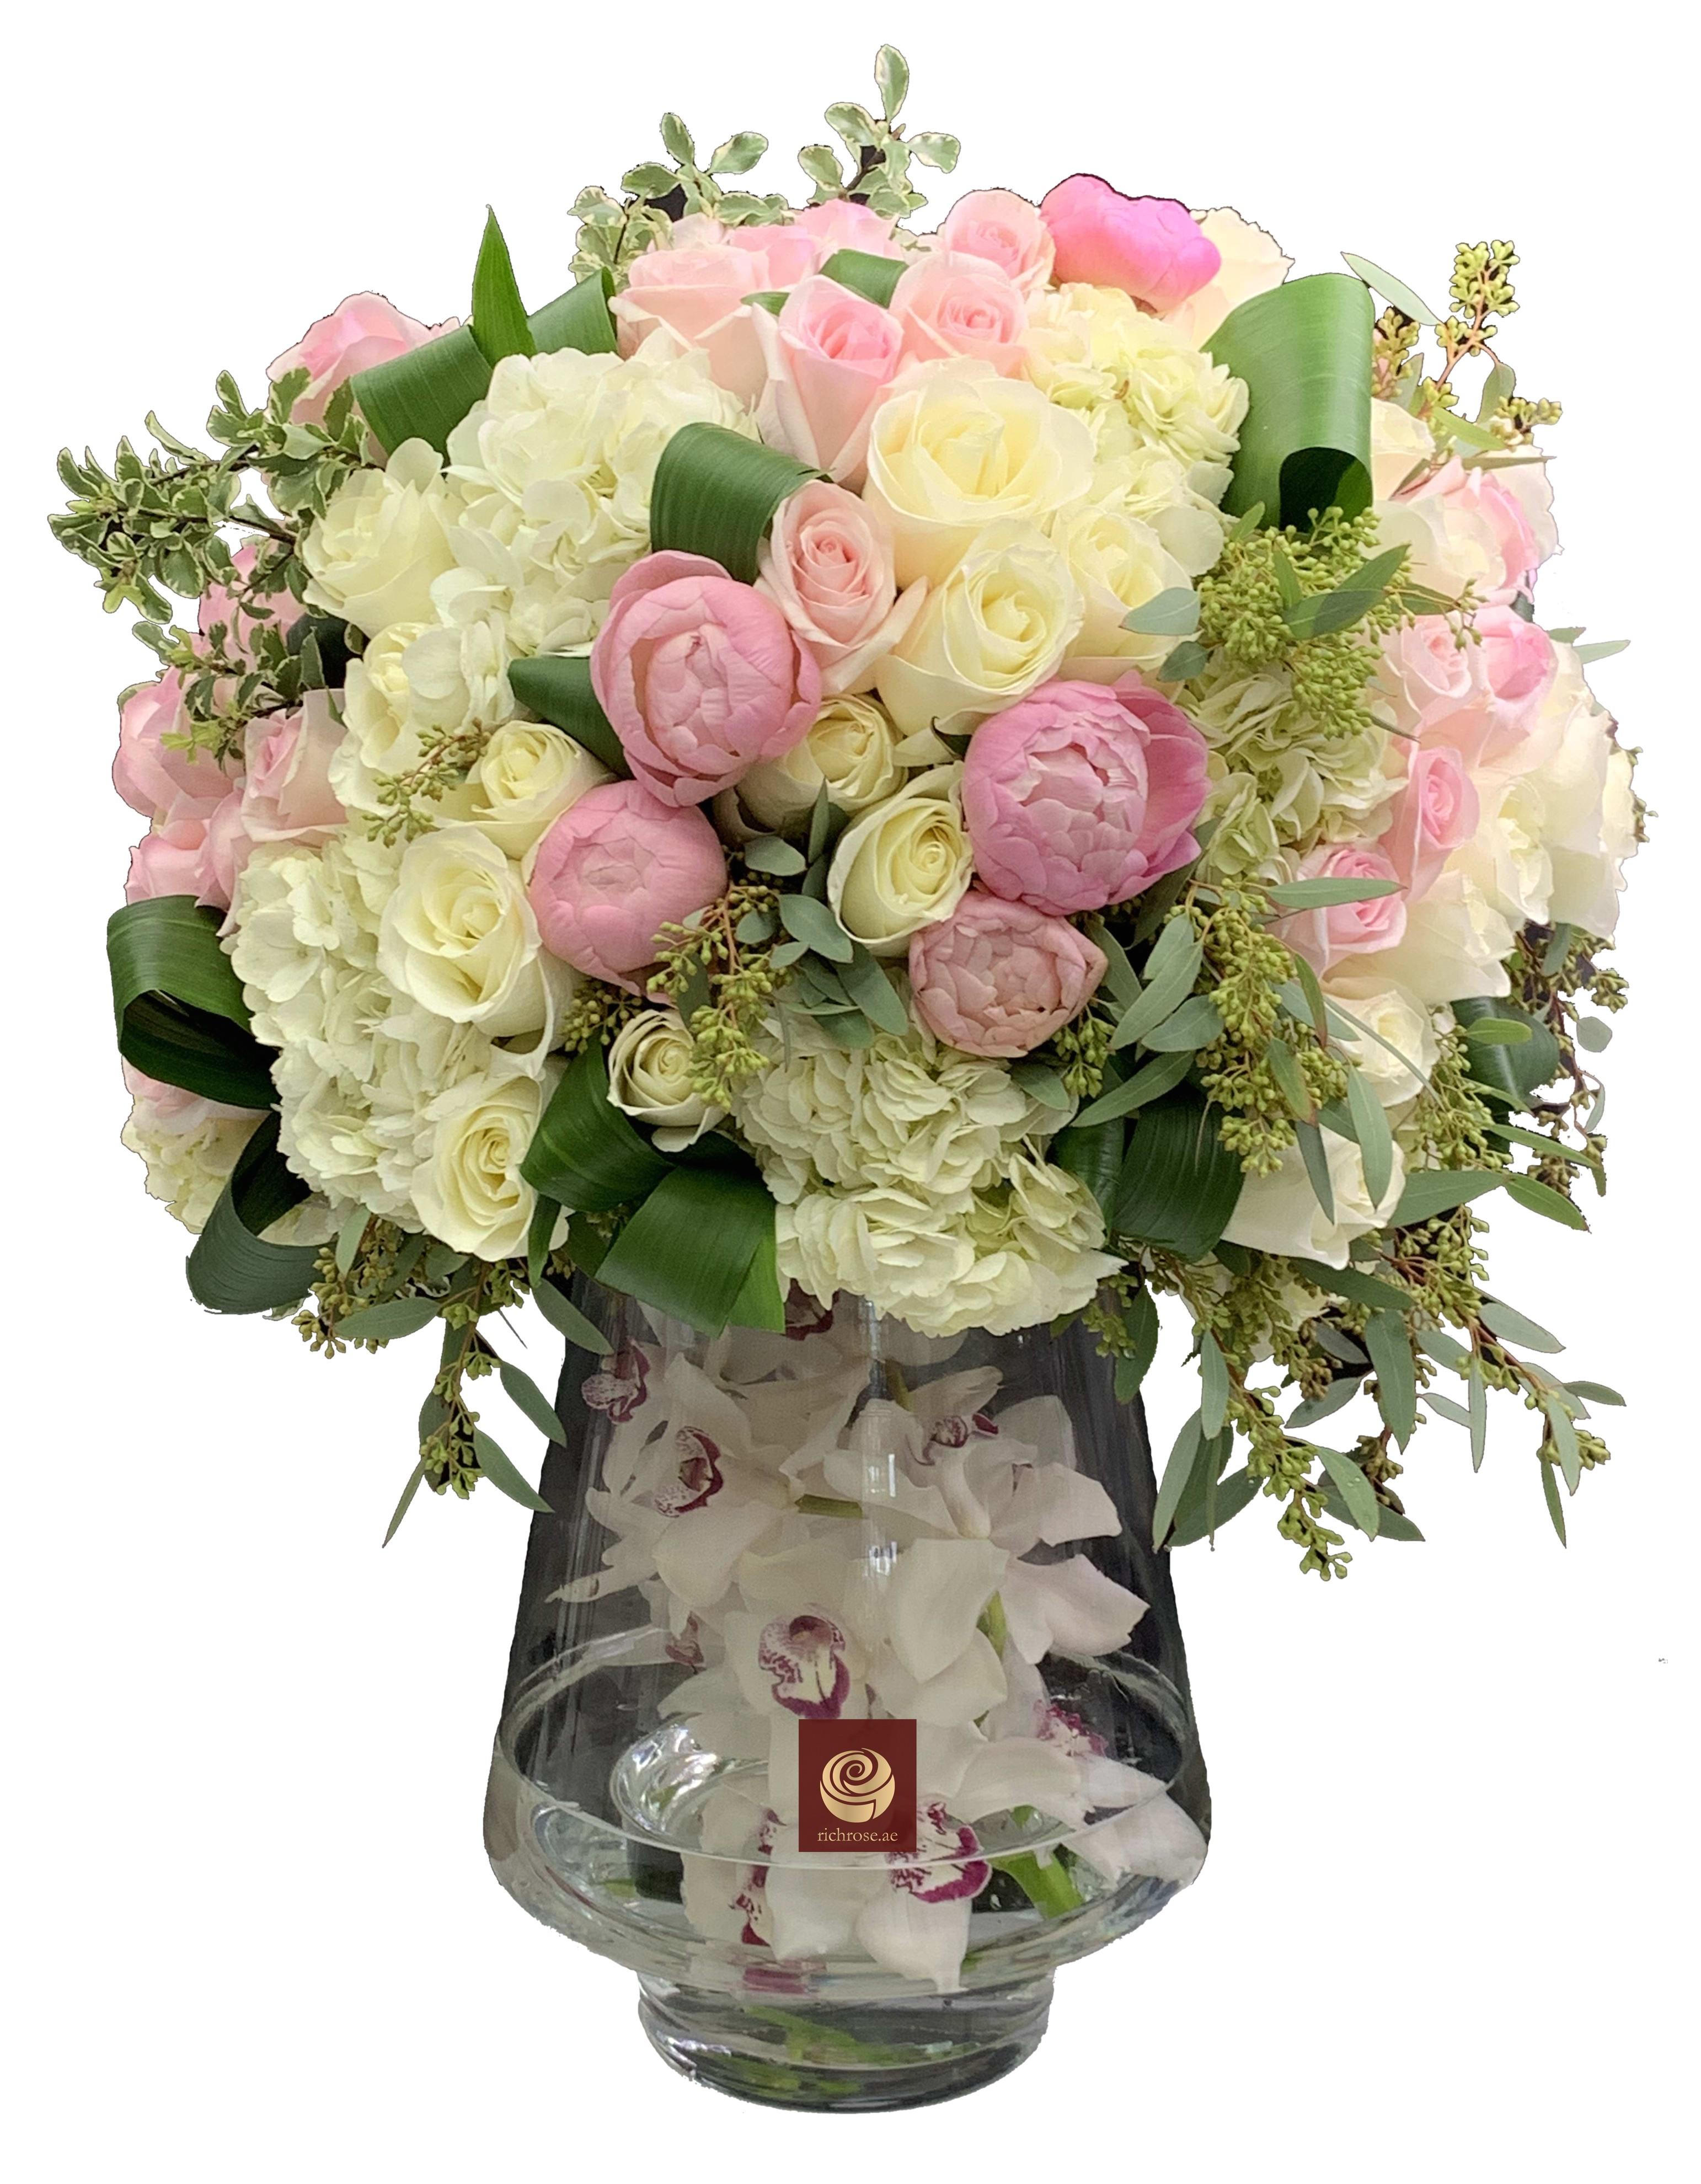 VANESSA - Exotic Purple and White Flower Arrangement